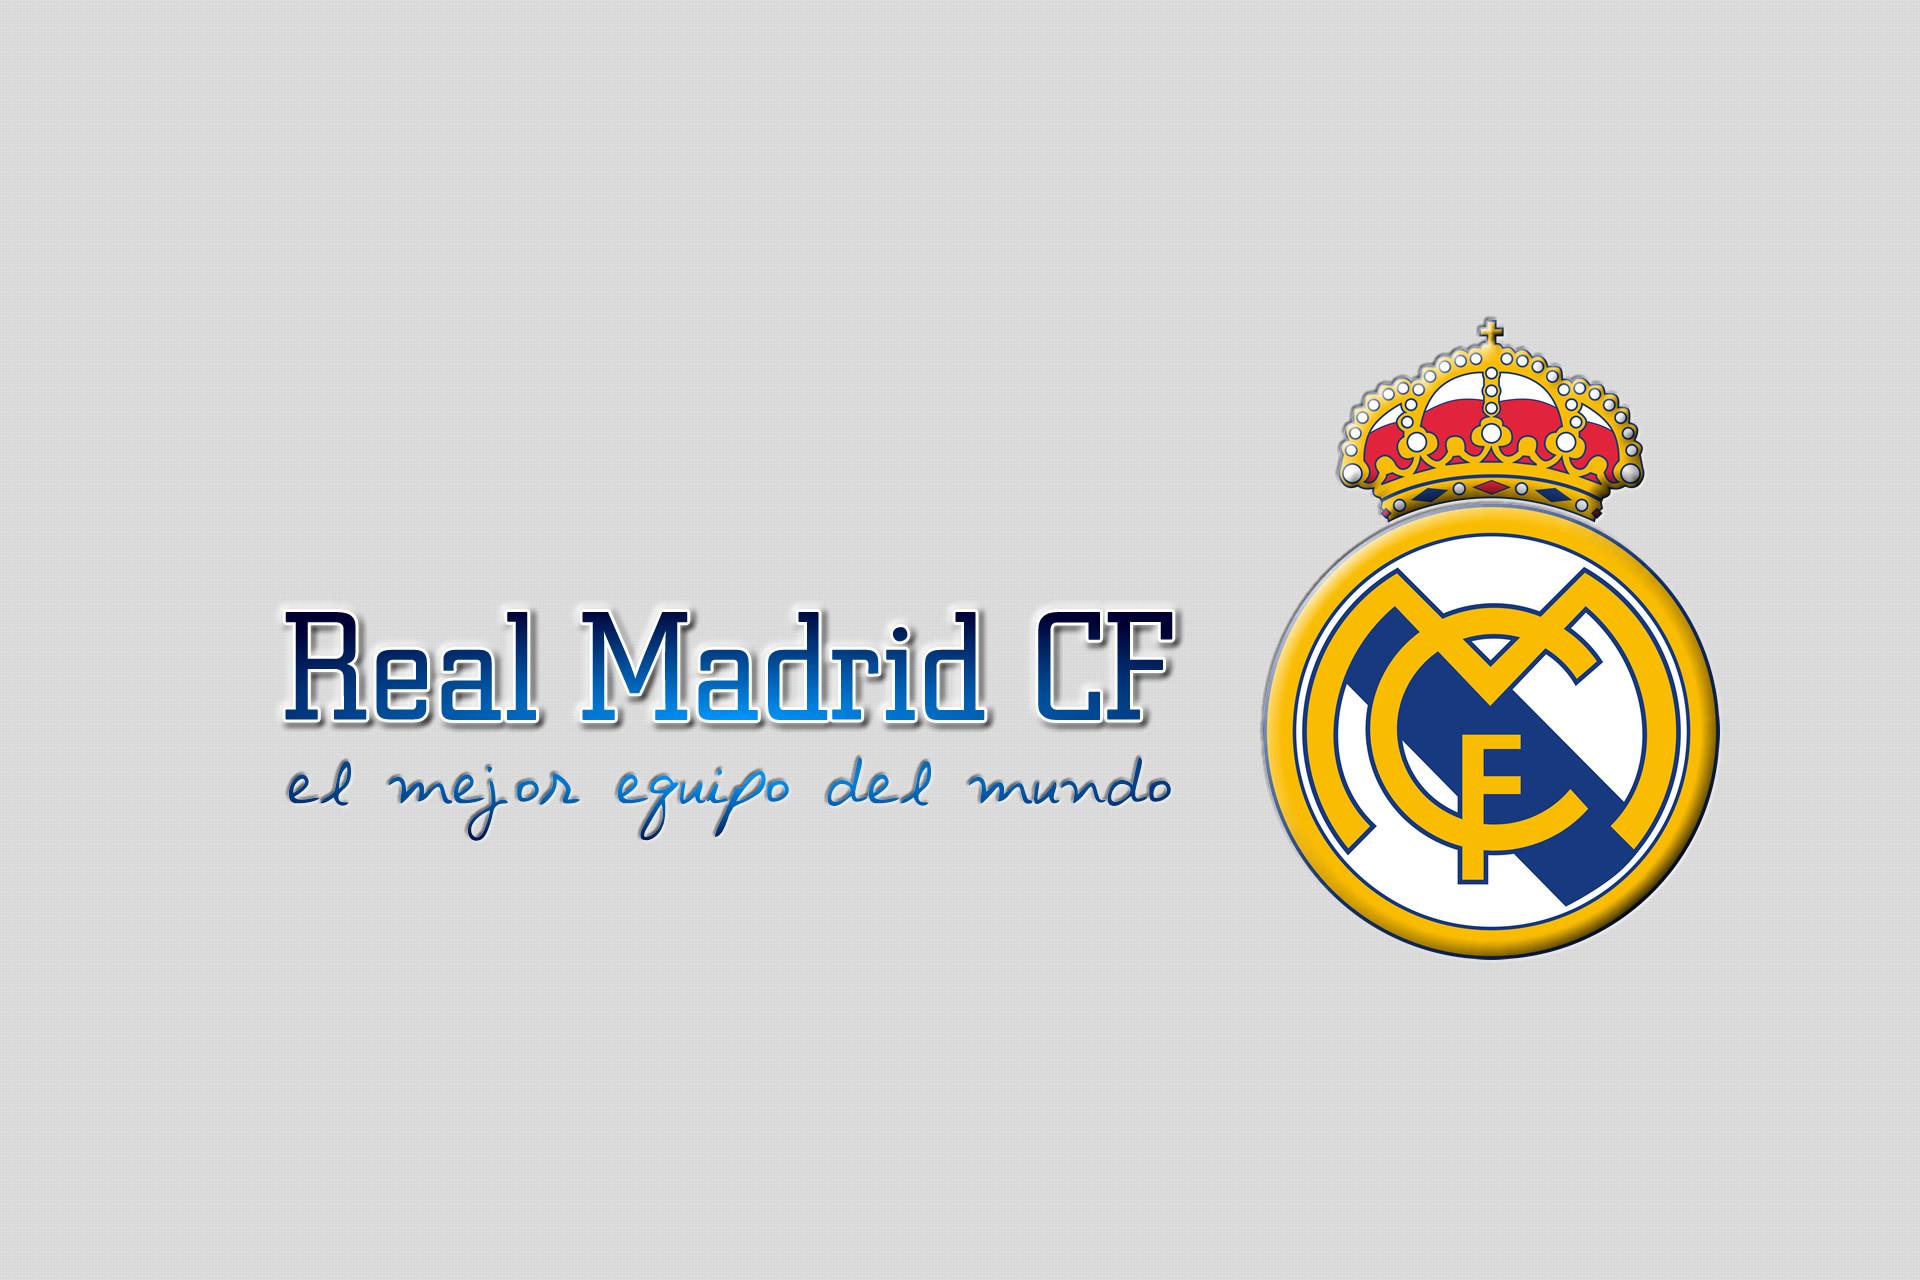 Real madrid logo wallpaper 66 images - Madrid wallpaper ...